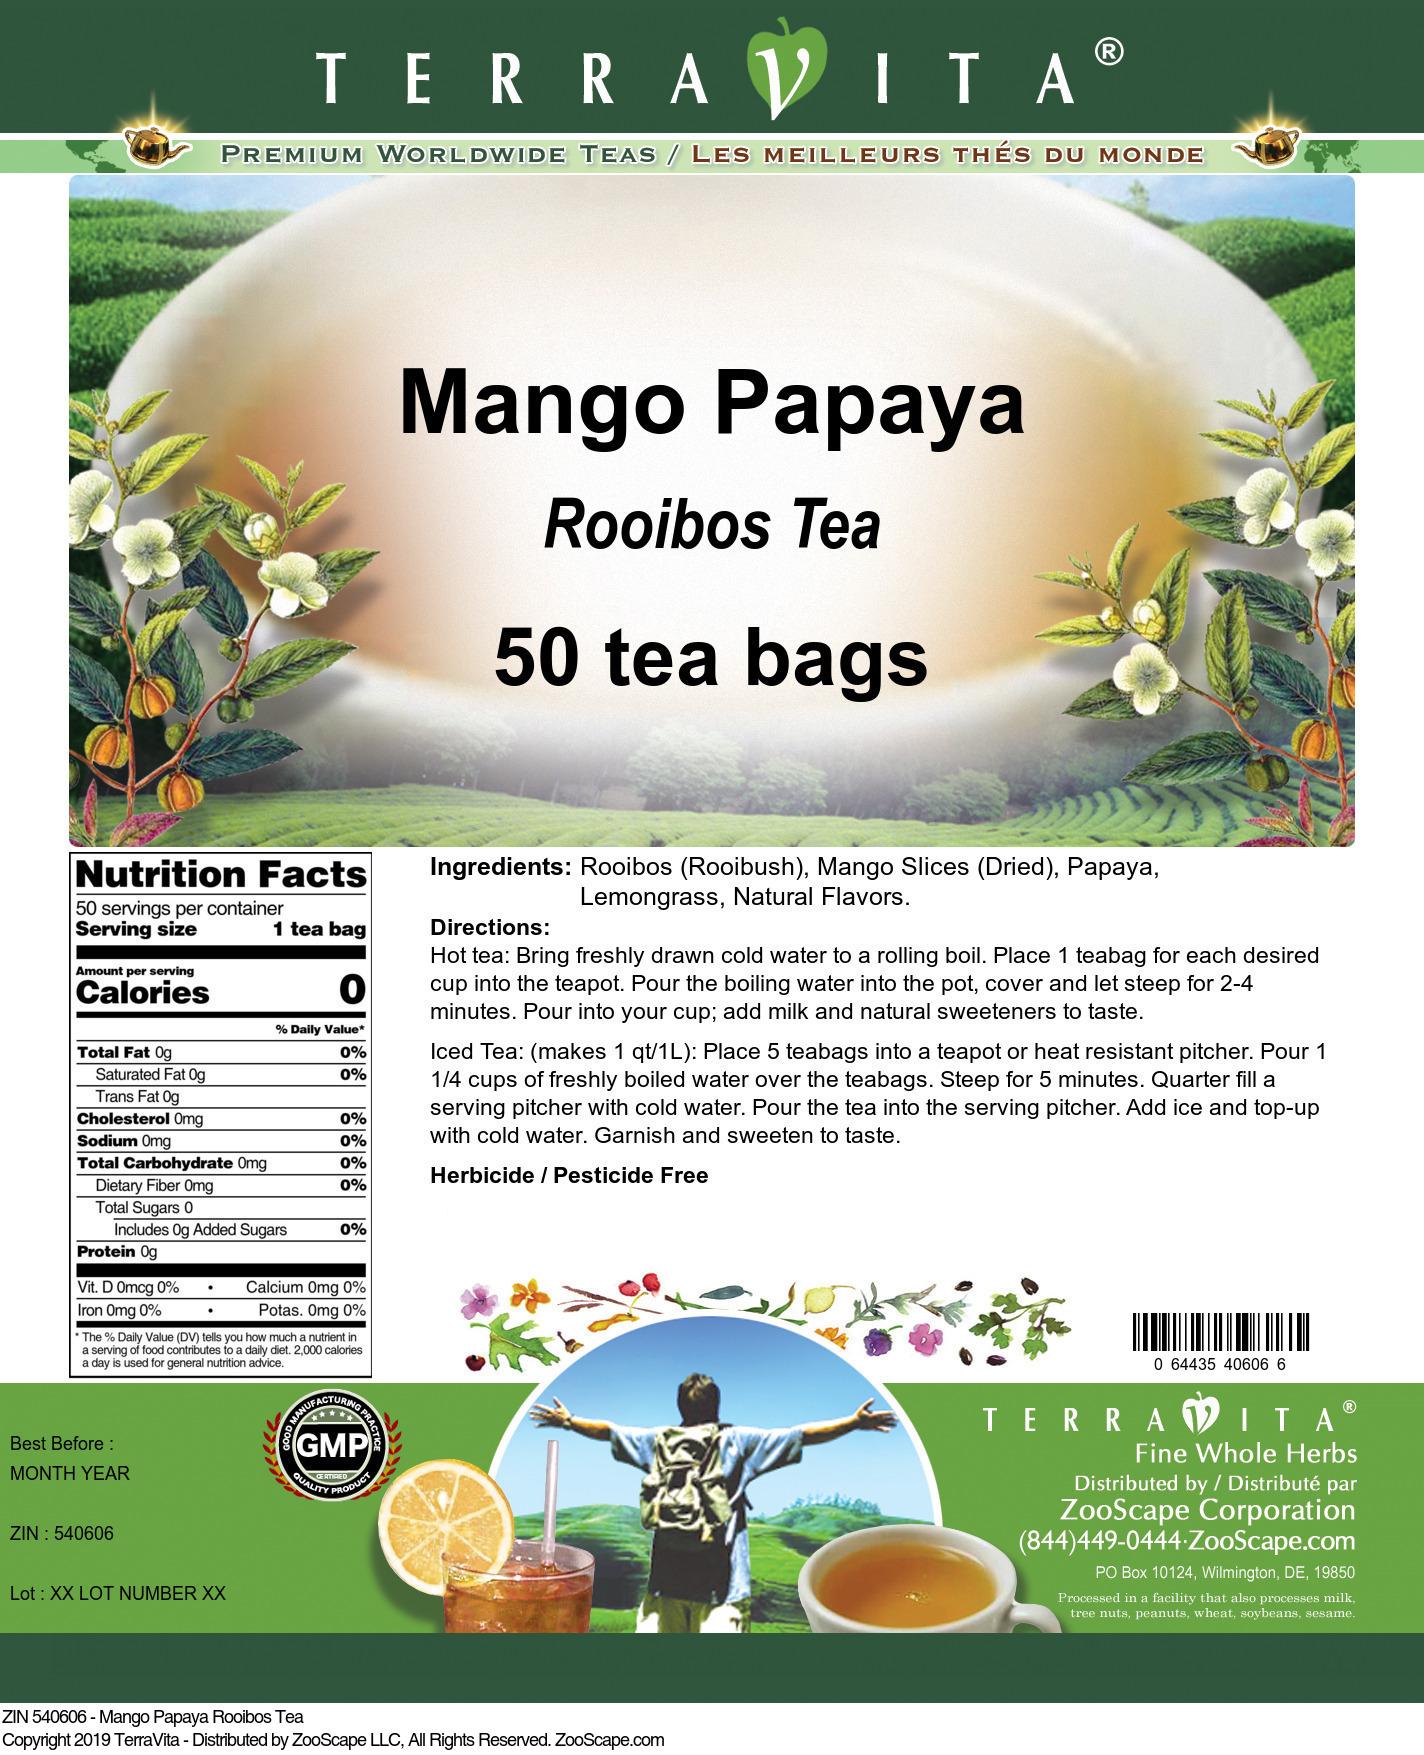 Mango Papaya Rooibos Tea